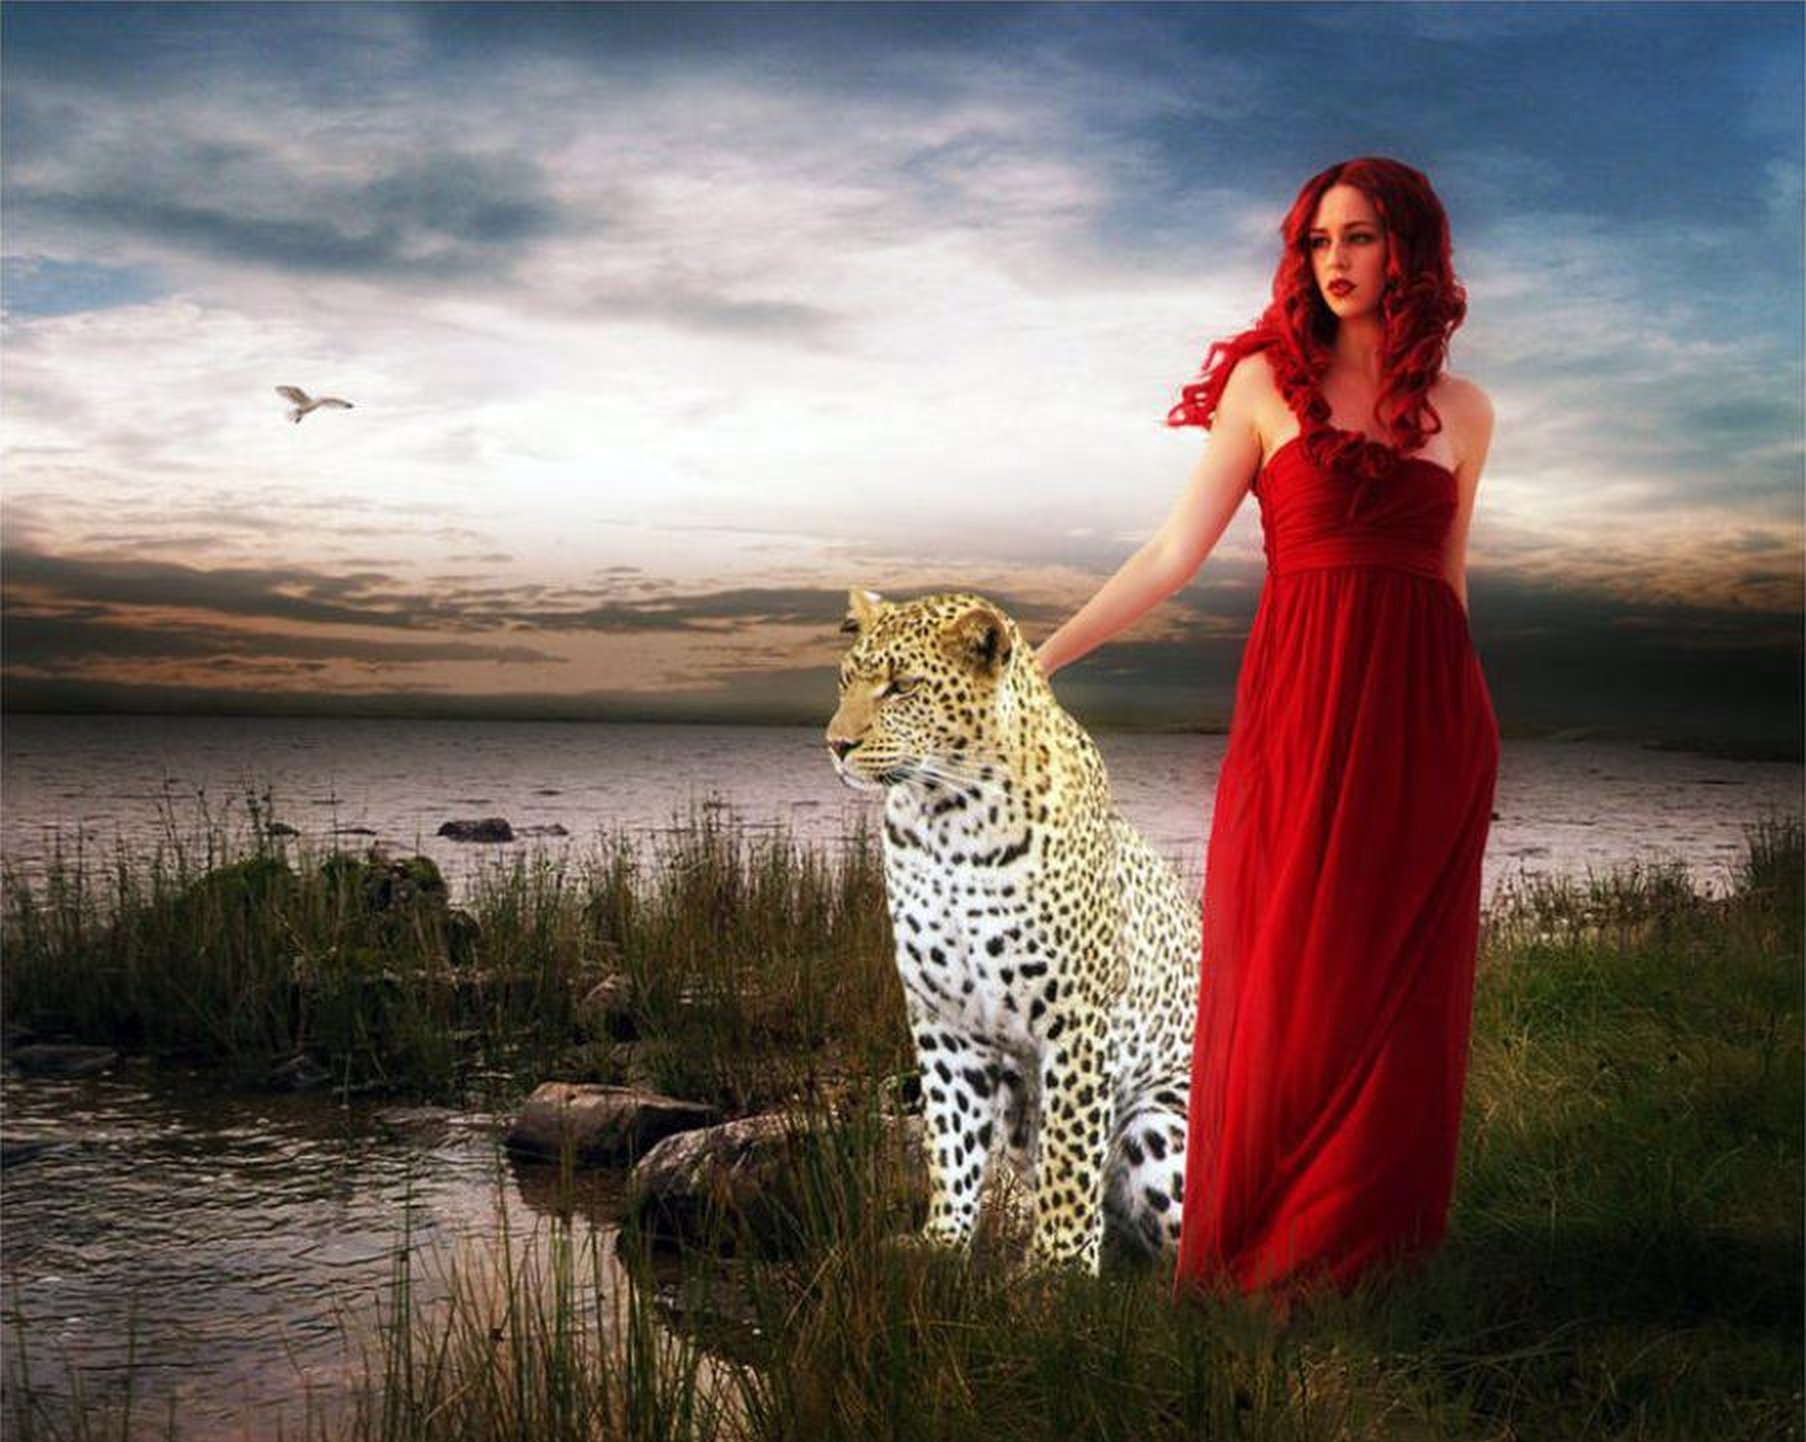 Girls Profile Wallpaper Red Tiger Fantasy Leopard Wild Lady Jessica Wallpaper